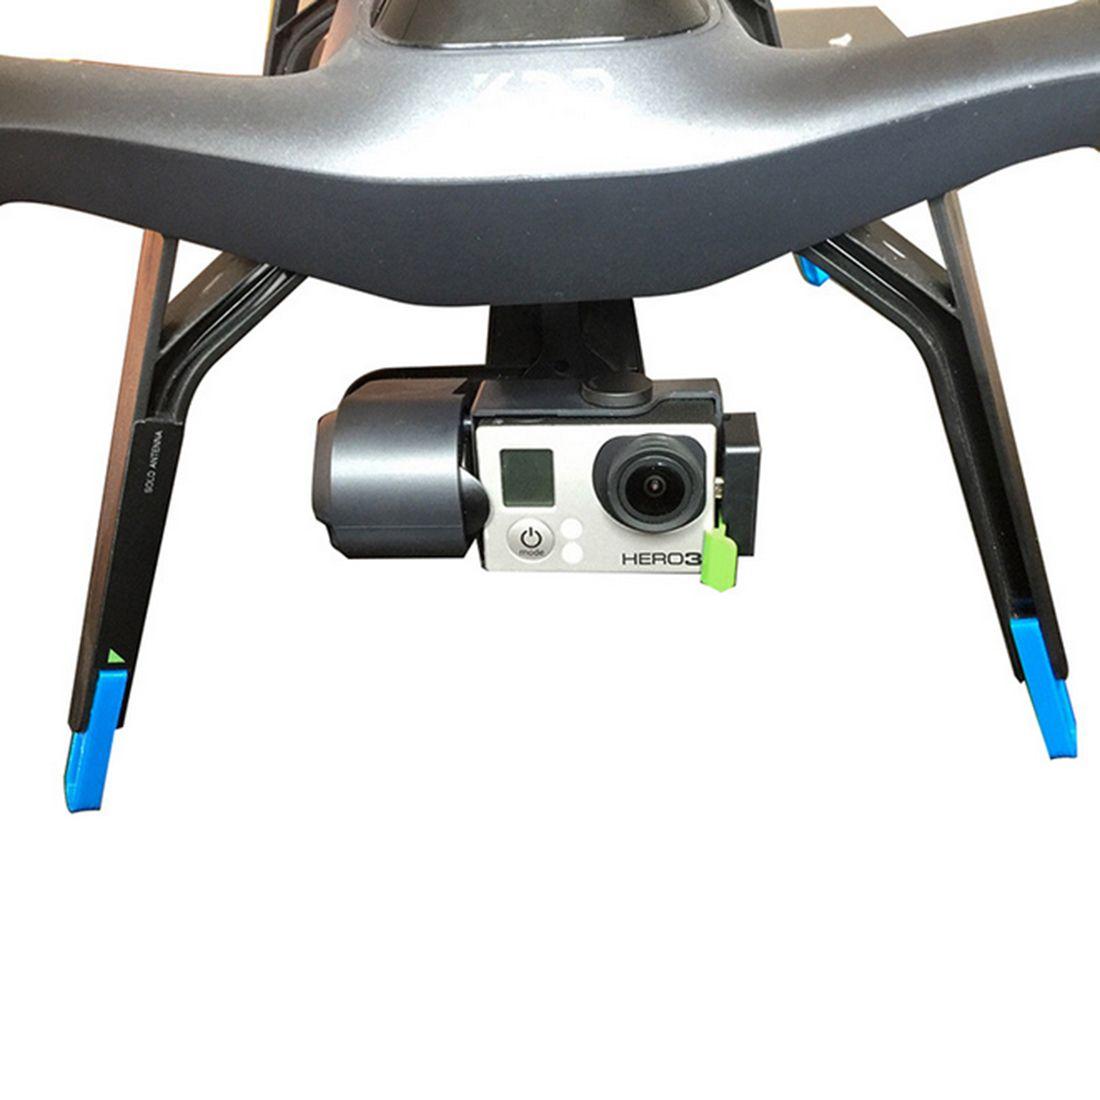 HOBBYINRC Landung Füße Leg Extensions Set Protector Erhöhen für 3DR Solo RC Drone Quadcopter FPV Kamera UAV